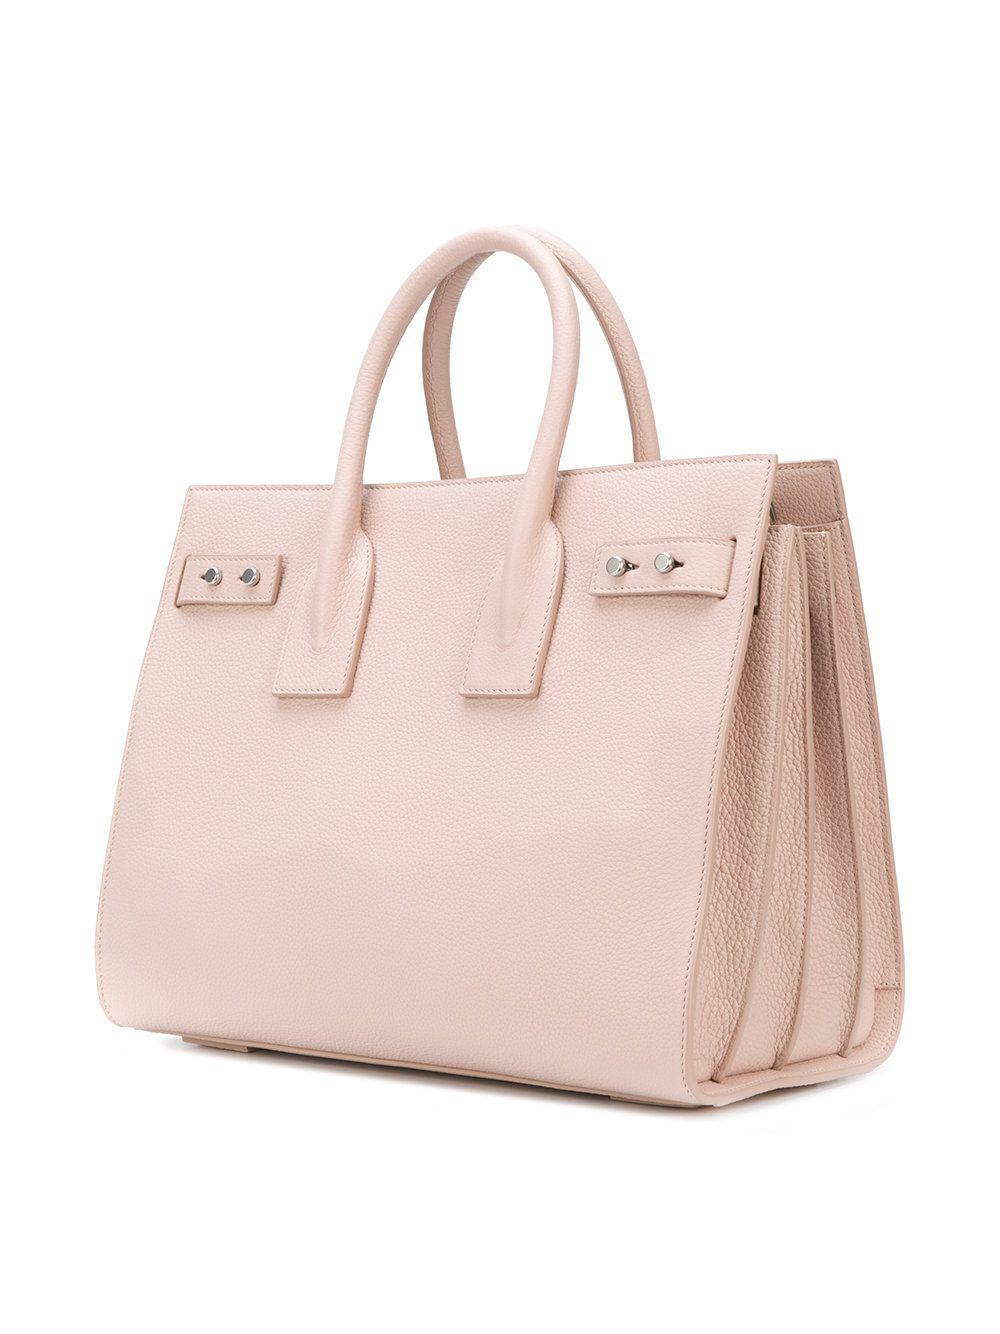 bf9bd4f30f Saint Laurent - Women s Pink Leather Handbag - Lyst. View fullscreen